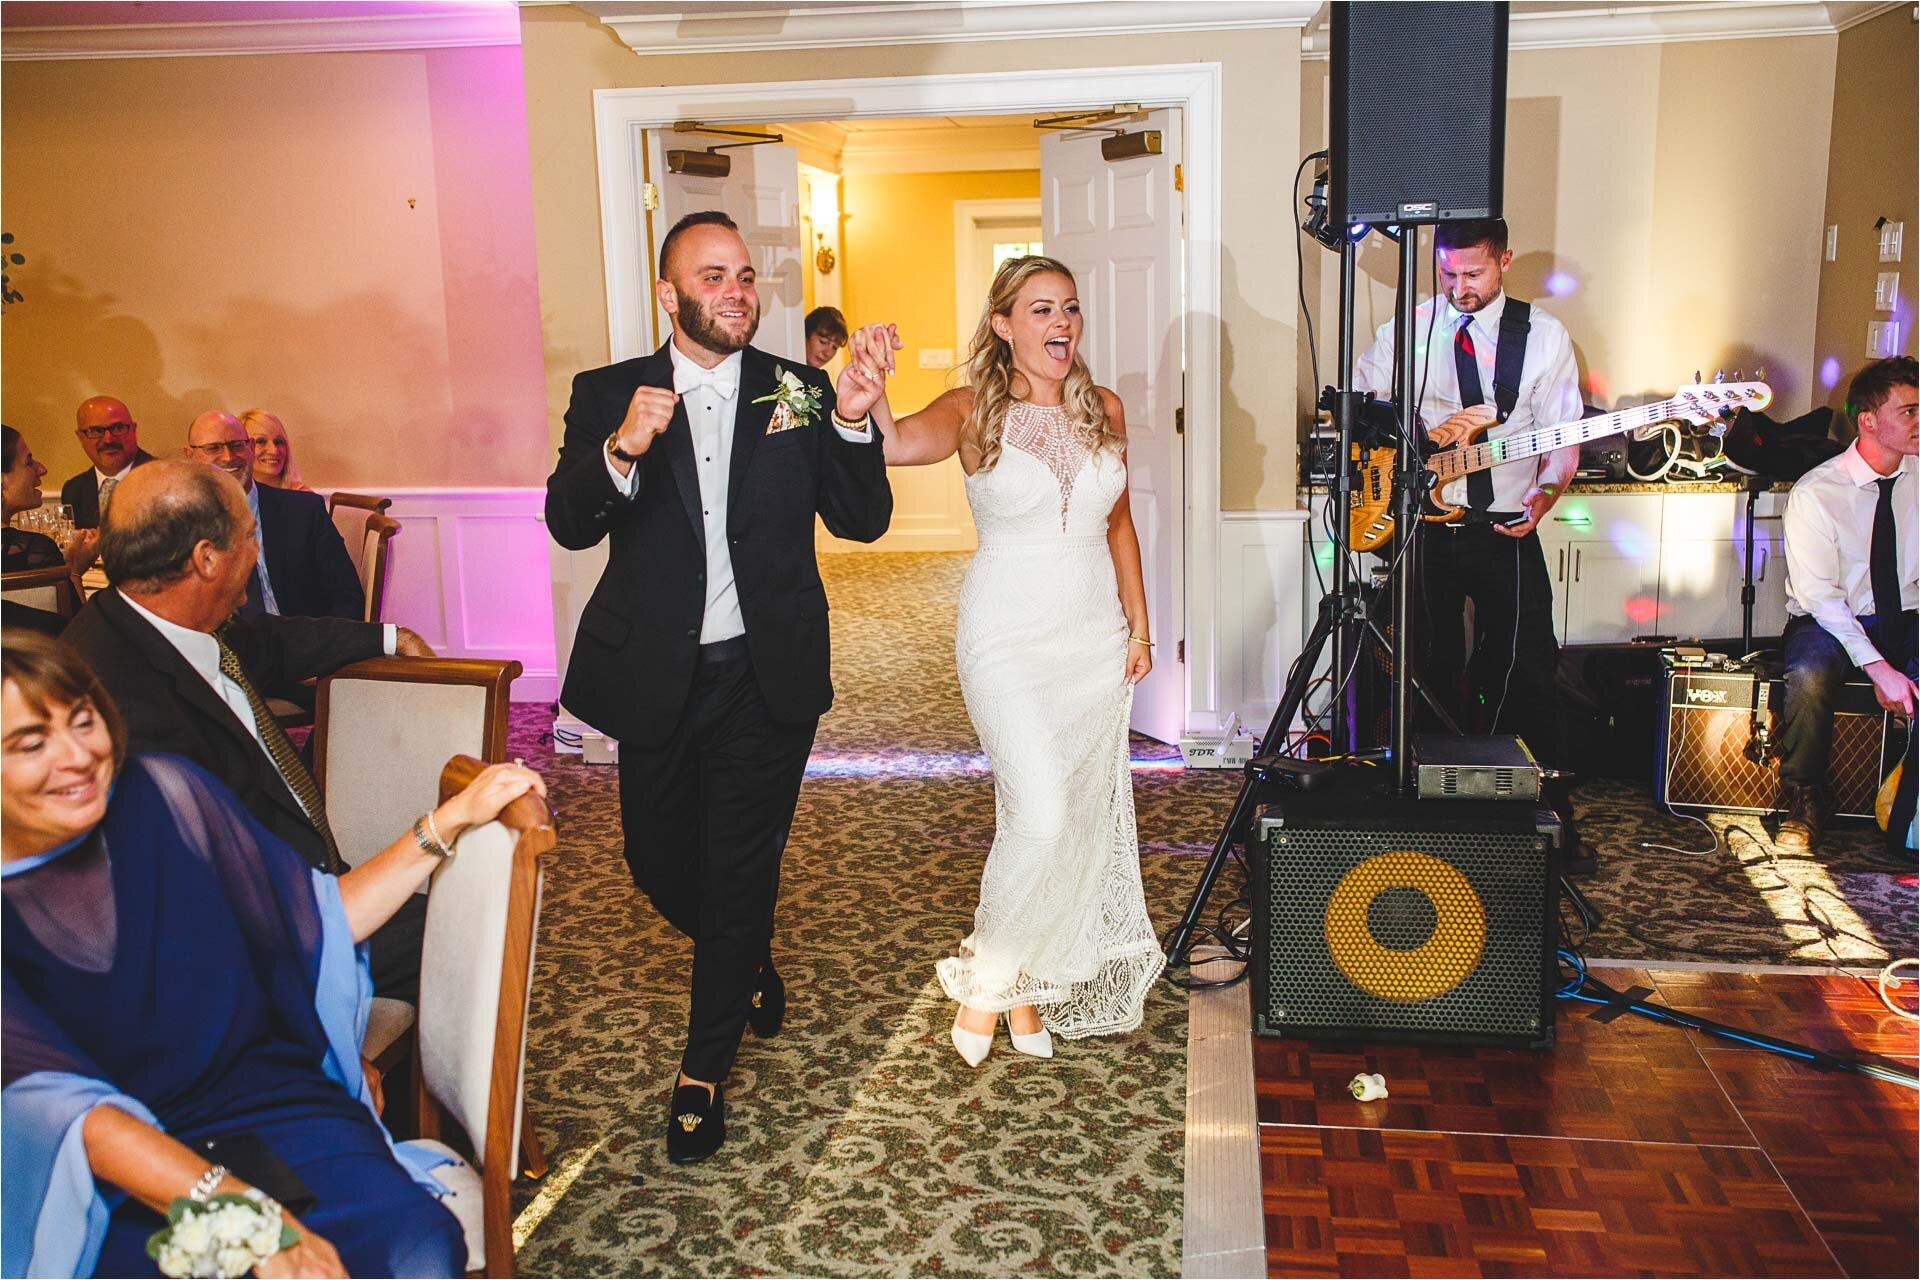 racebrook-countryclub-wedding-photography-26.jpg